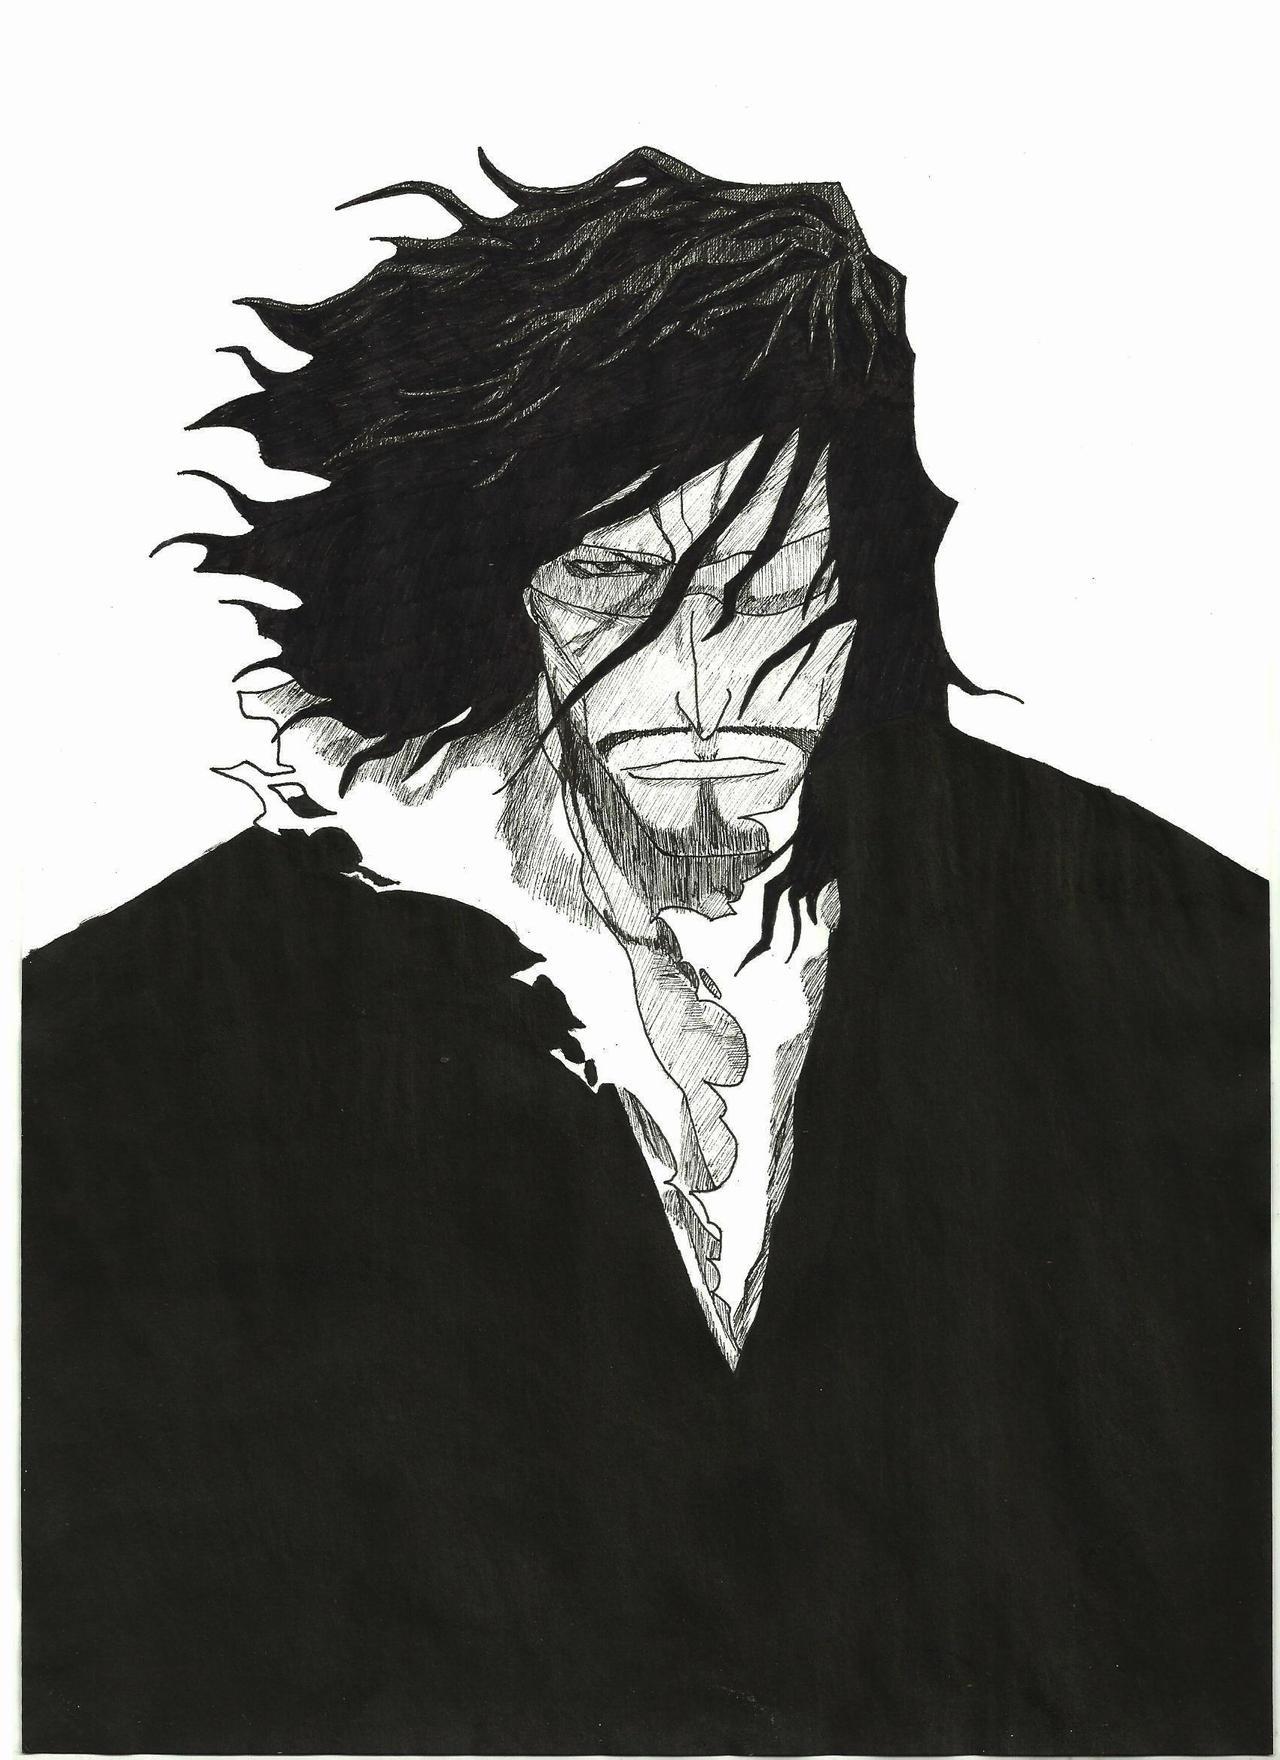 old anime manga: Old Man Zangetsu By CptMaximum9001 On DeviantArt